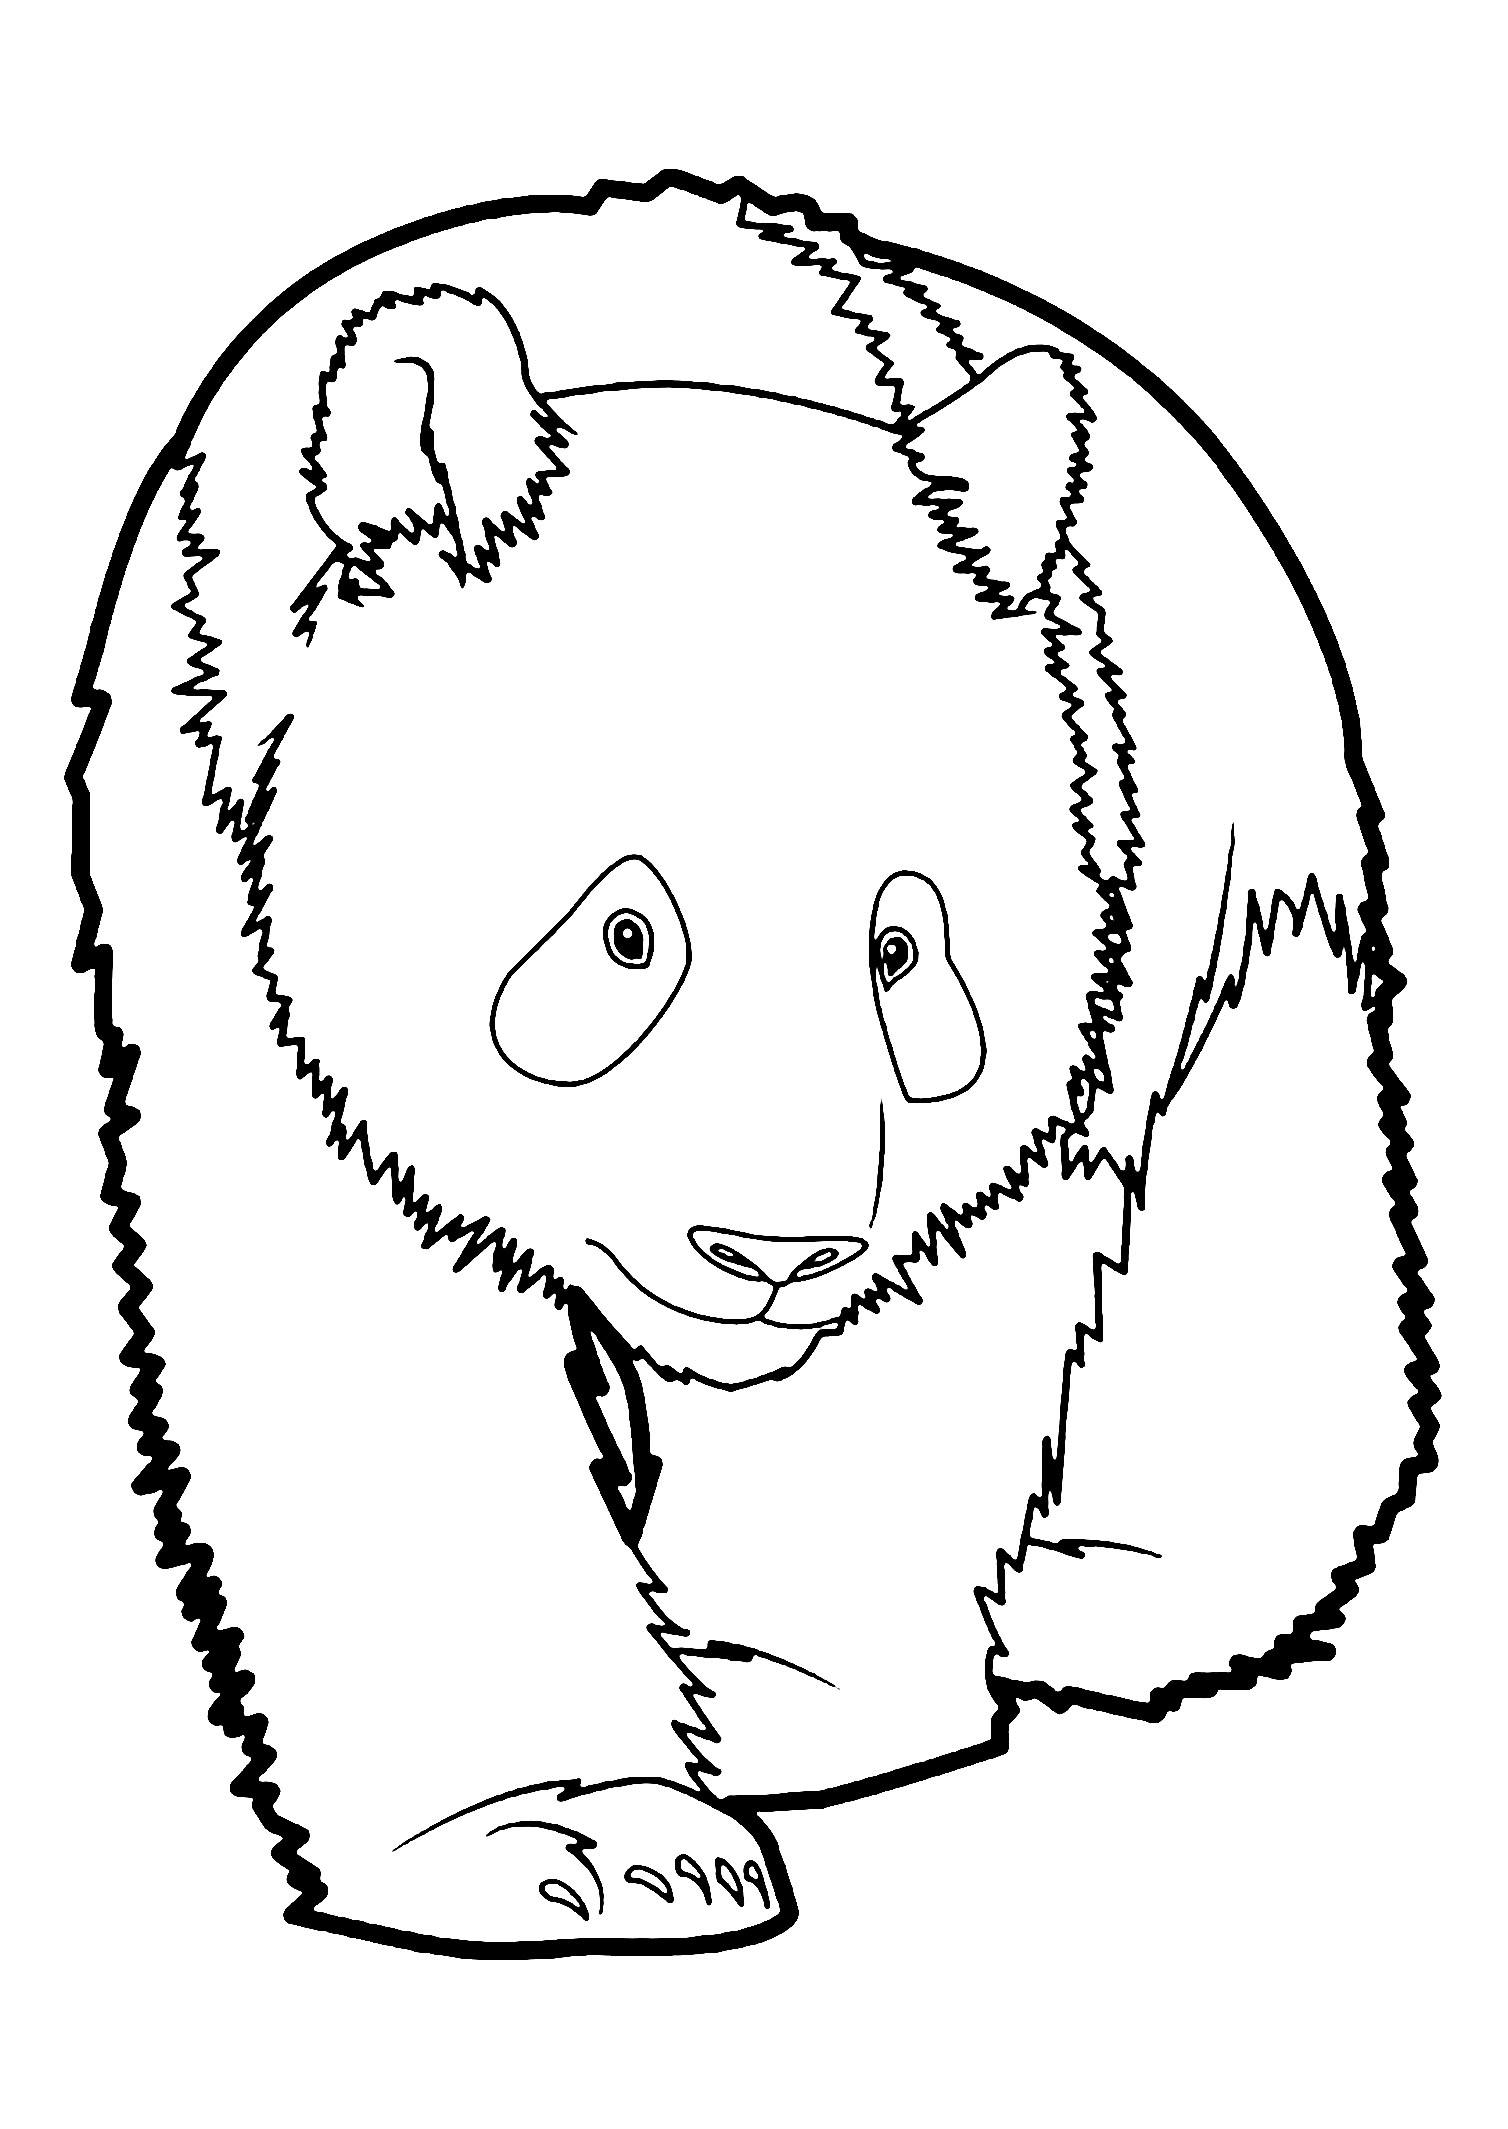 coloring panda panda coloring pages for adults at getdrawings free download coloring panda